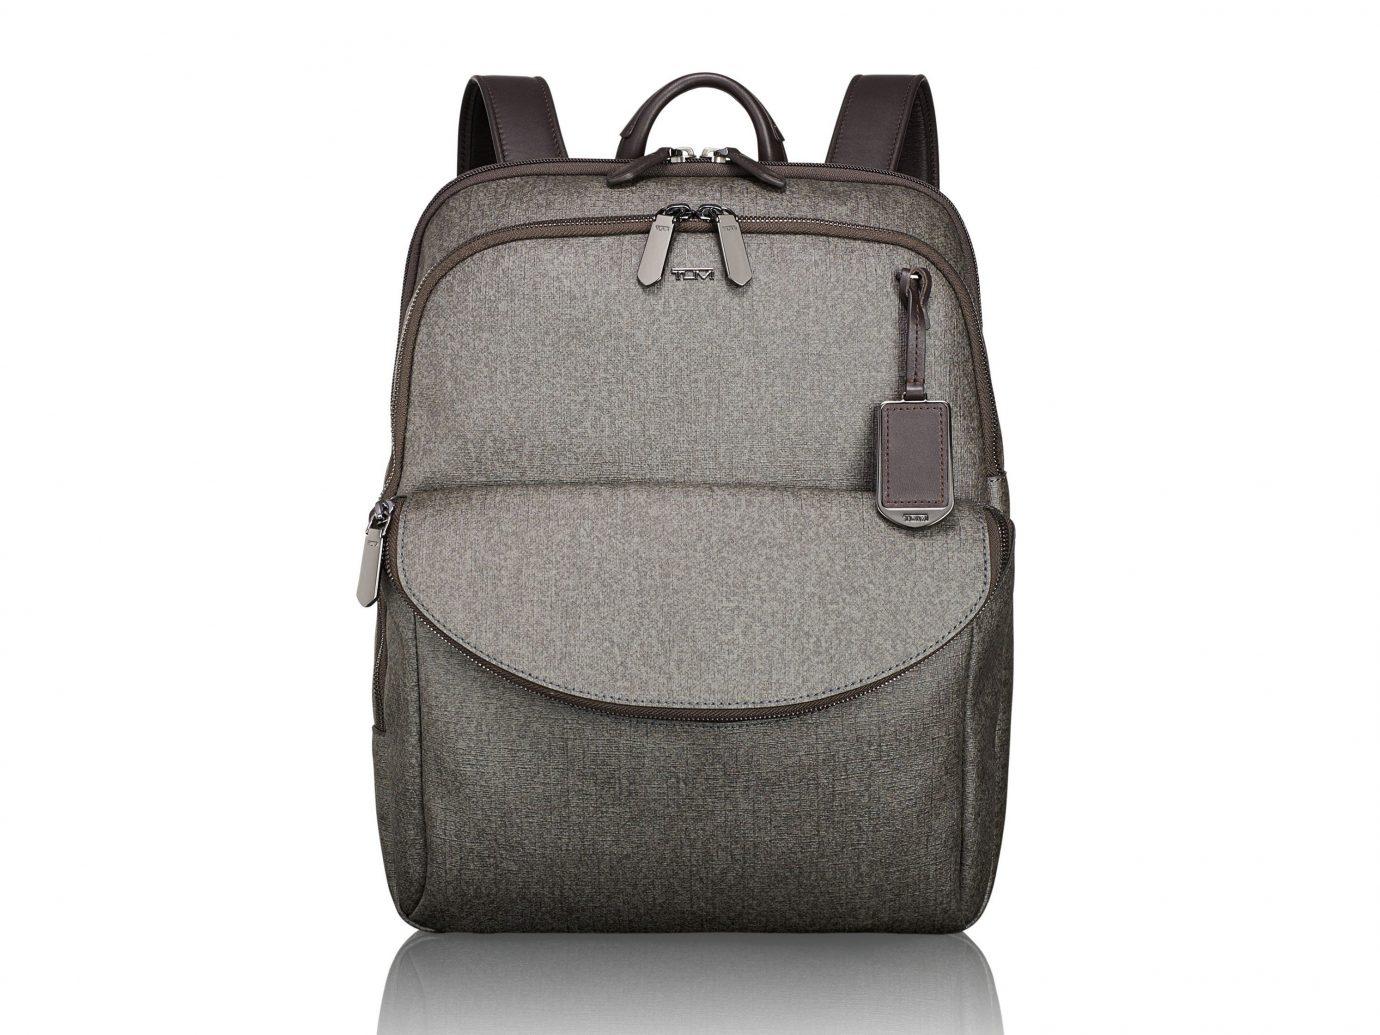 Style + Design bag accessory product backpack case shoulder bag product design hand luggage leather luggage & bags baggage pocket handbag